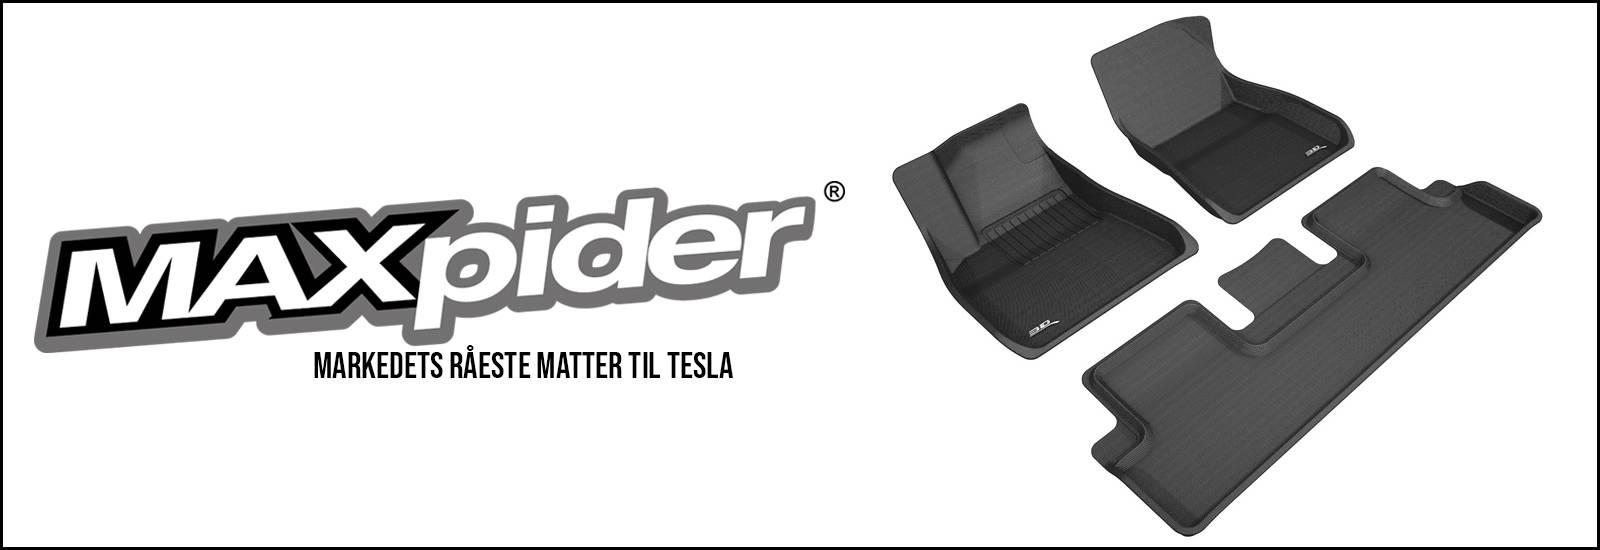 maxpider tesla model s 3 x bilmatter gulvmatter matter